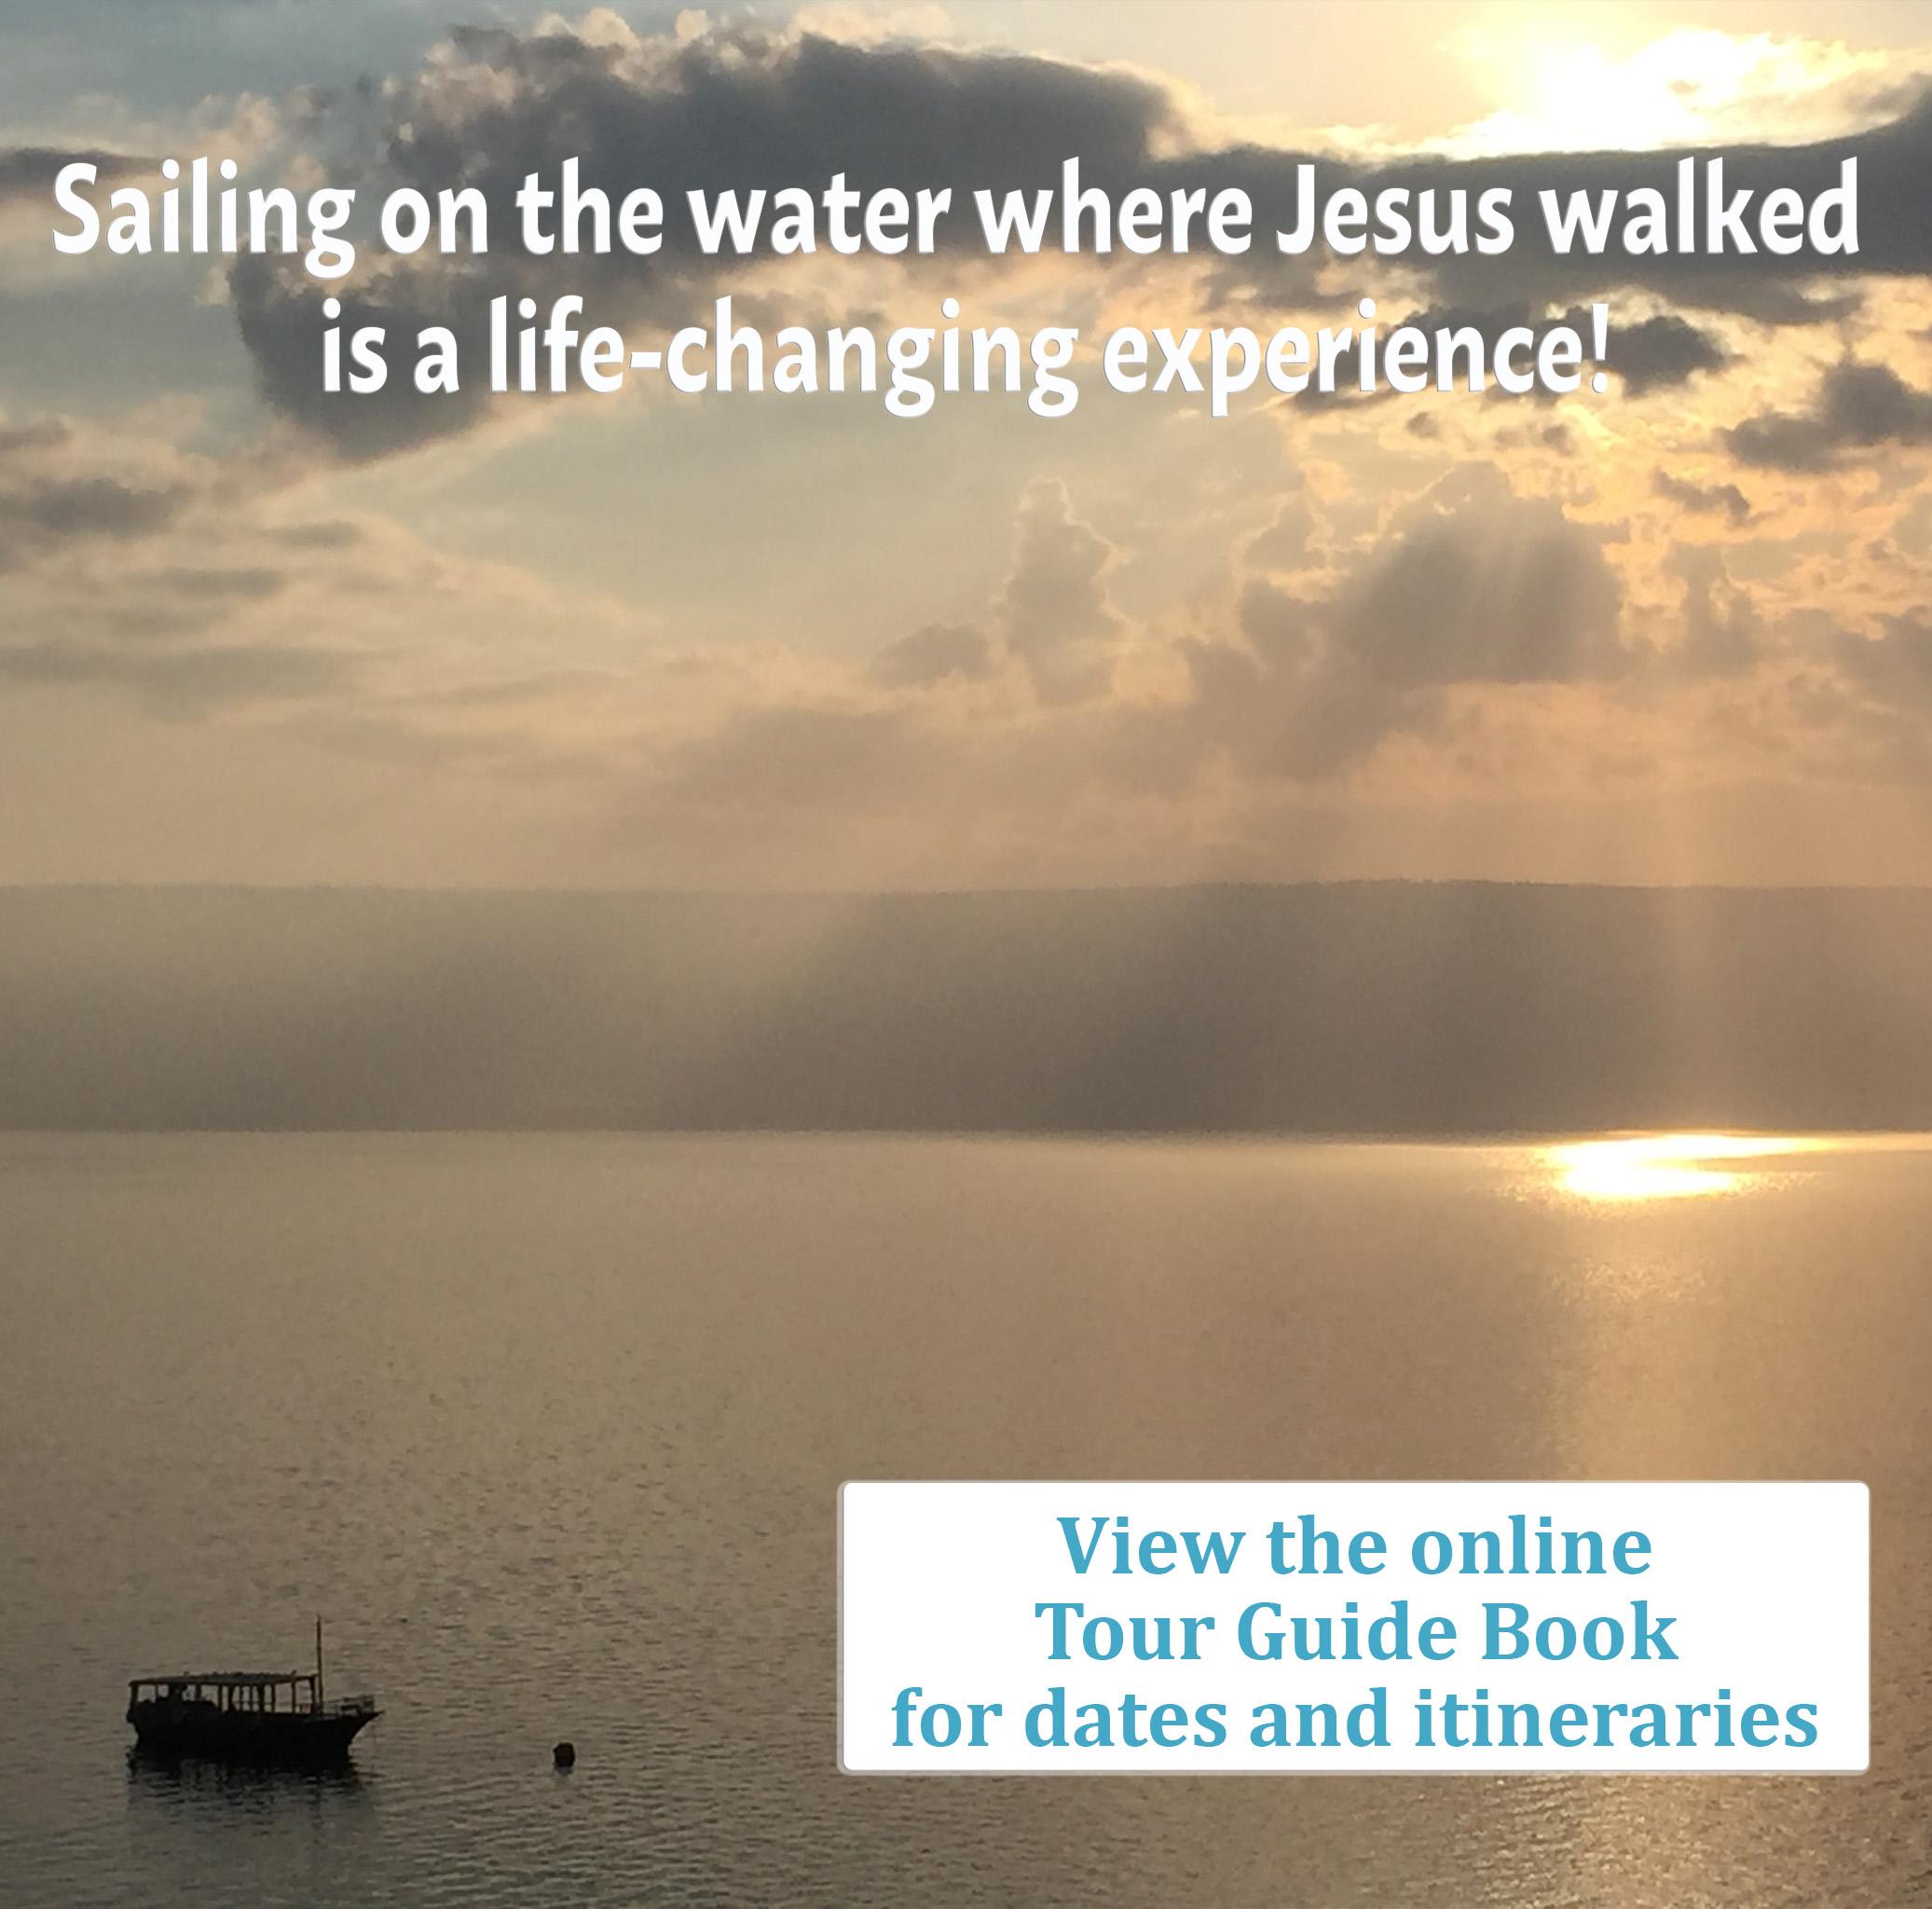 Sailing where Jesus walked